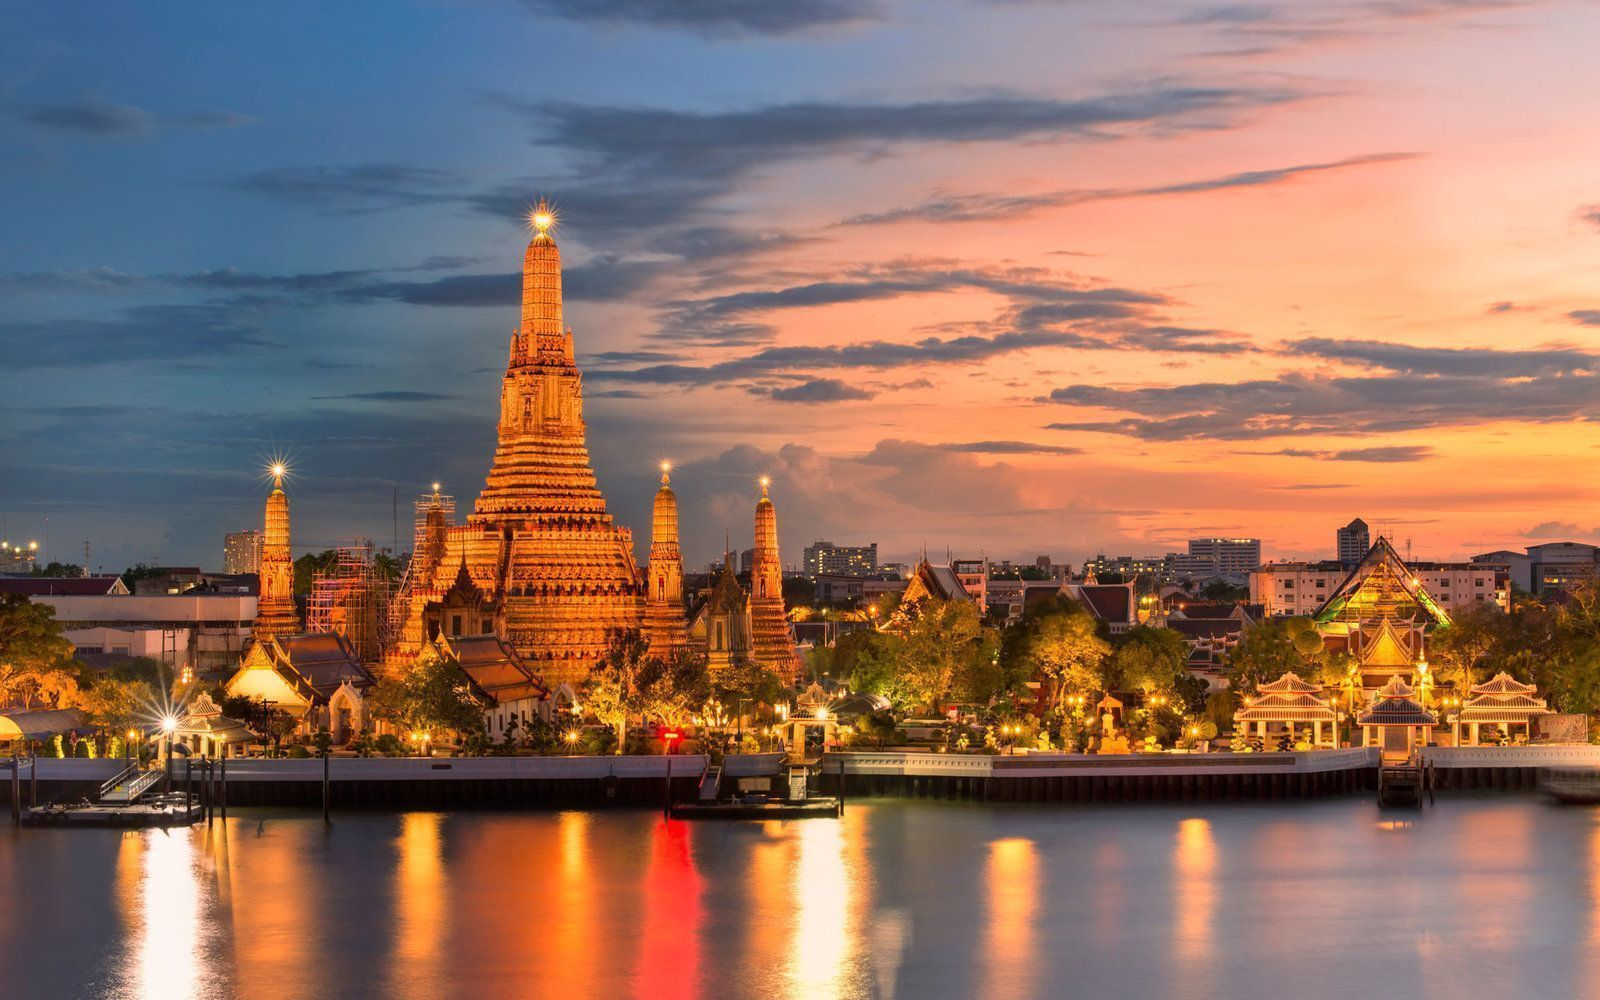 Bangkok_Tailandia_Blog-Viajes_el-Viaje-No-Terrmina.jpg?ssl=1